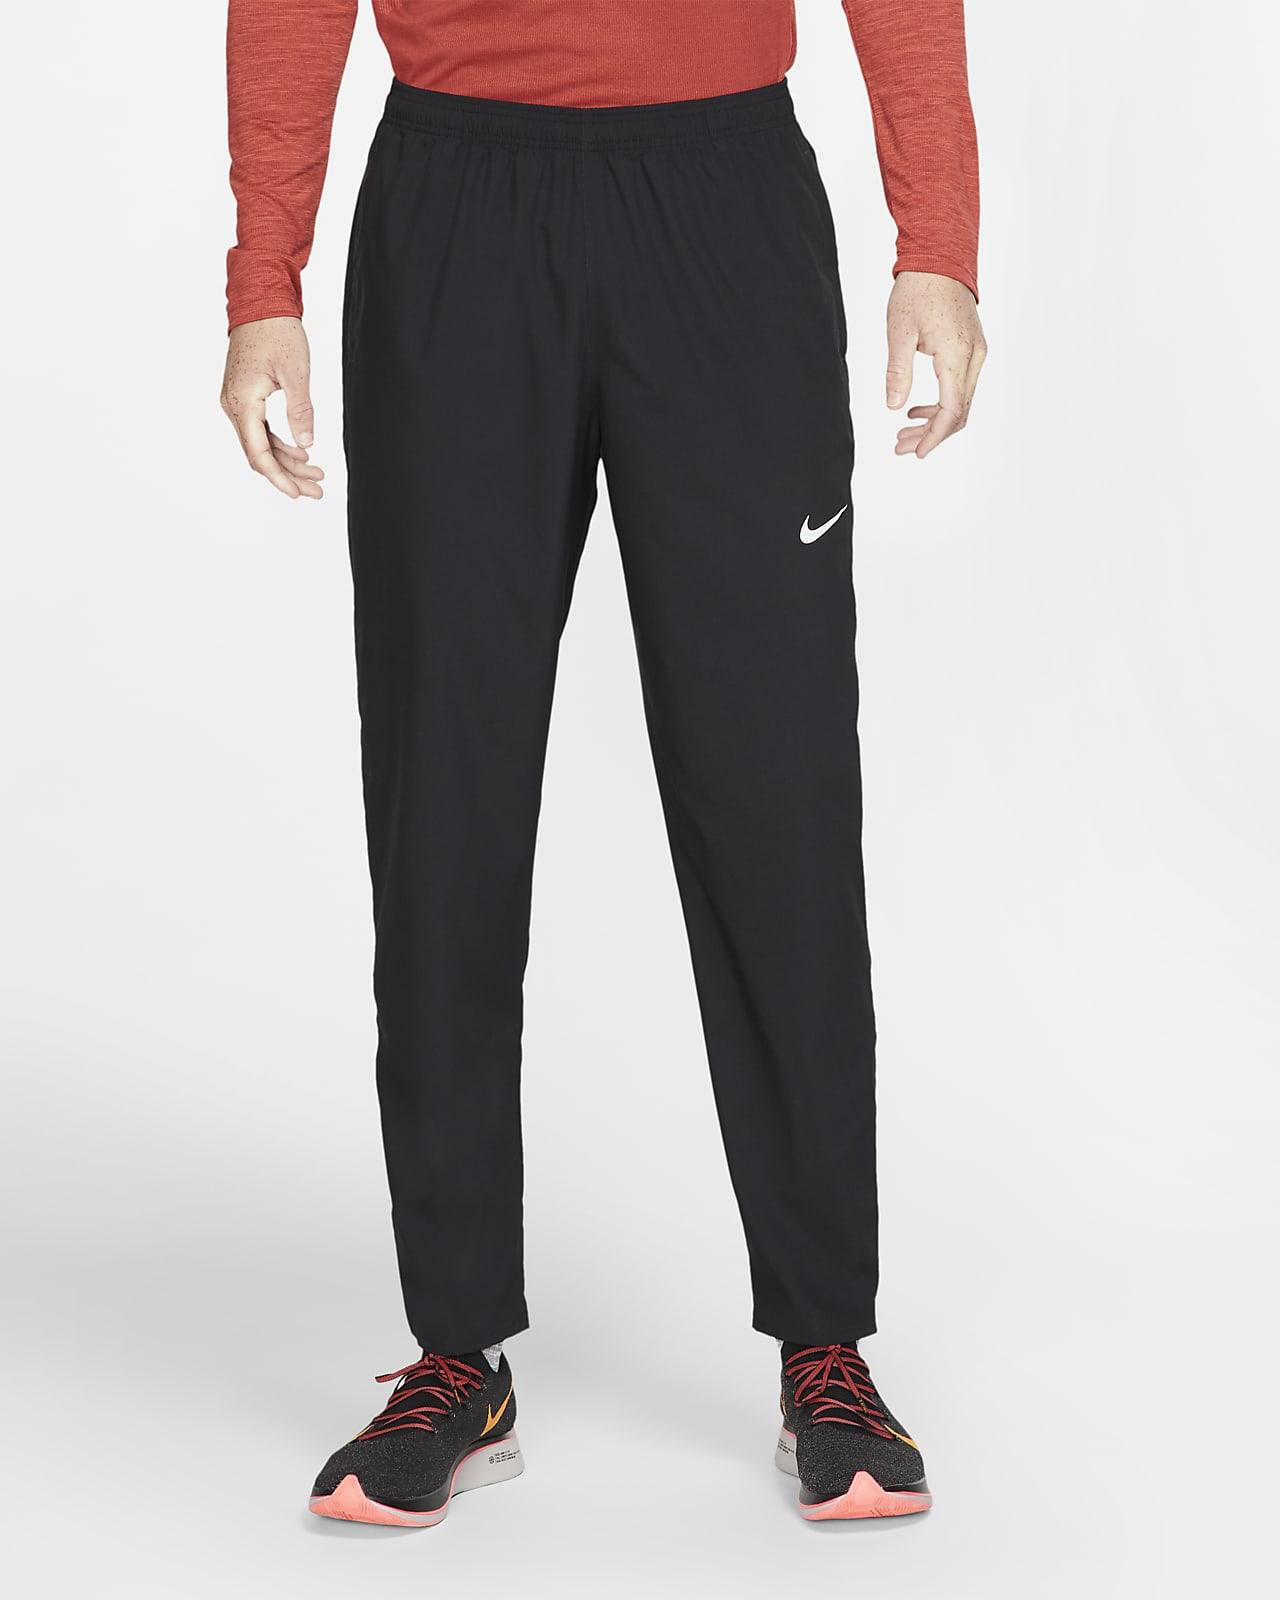 Nike Men's Woven Running Trousers